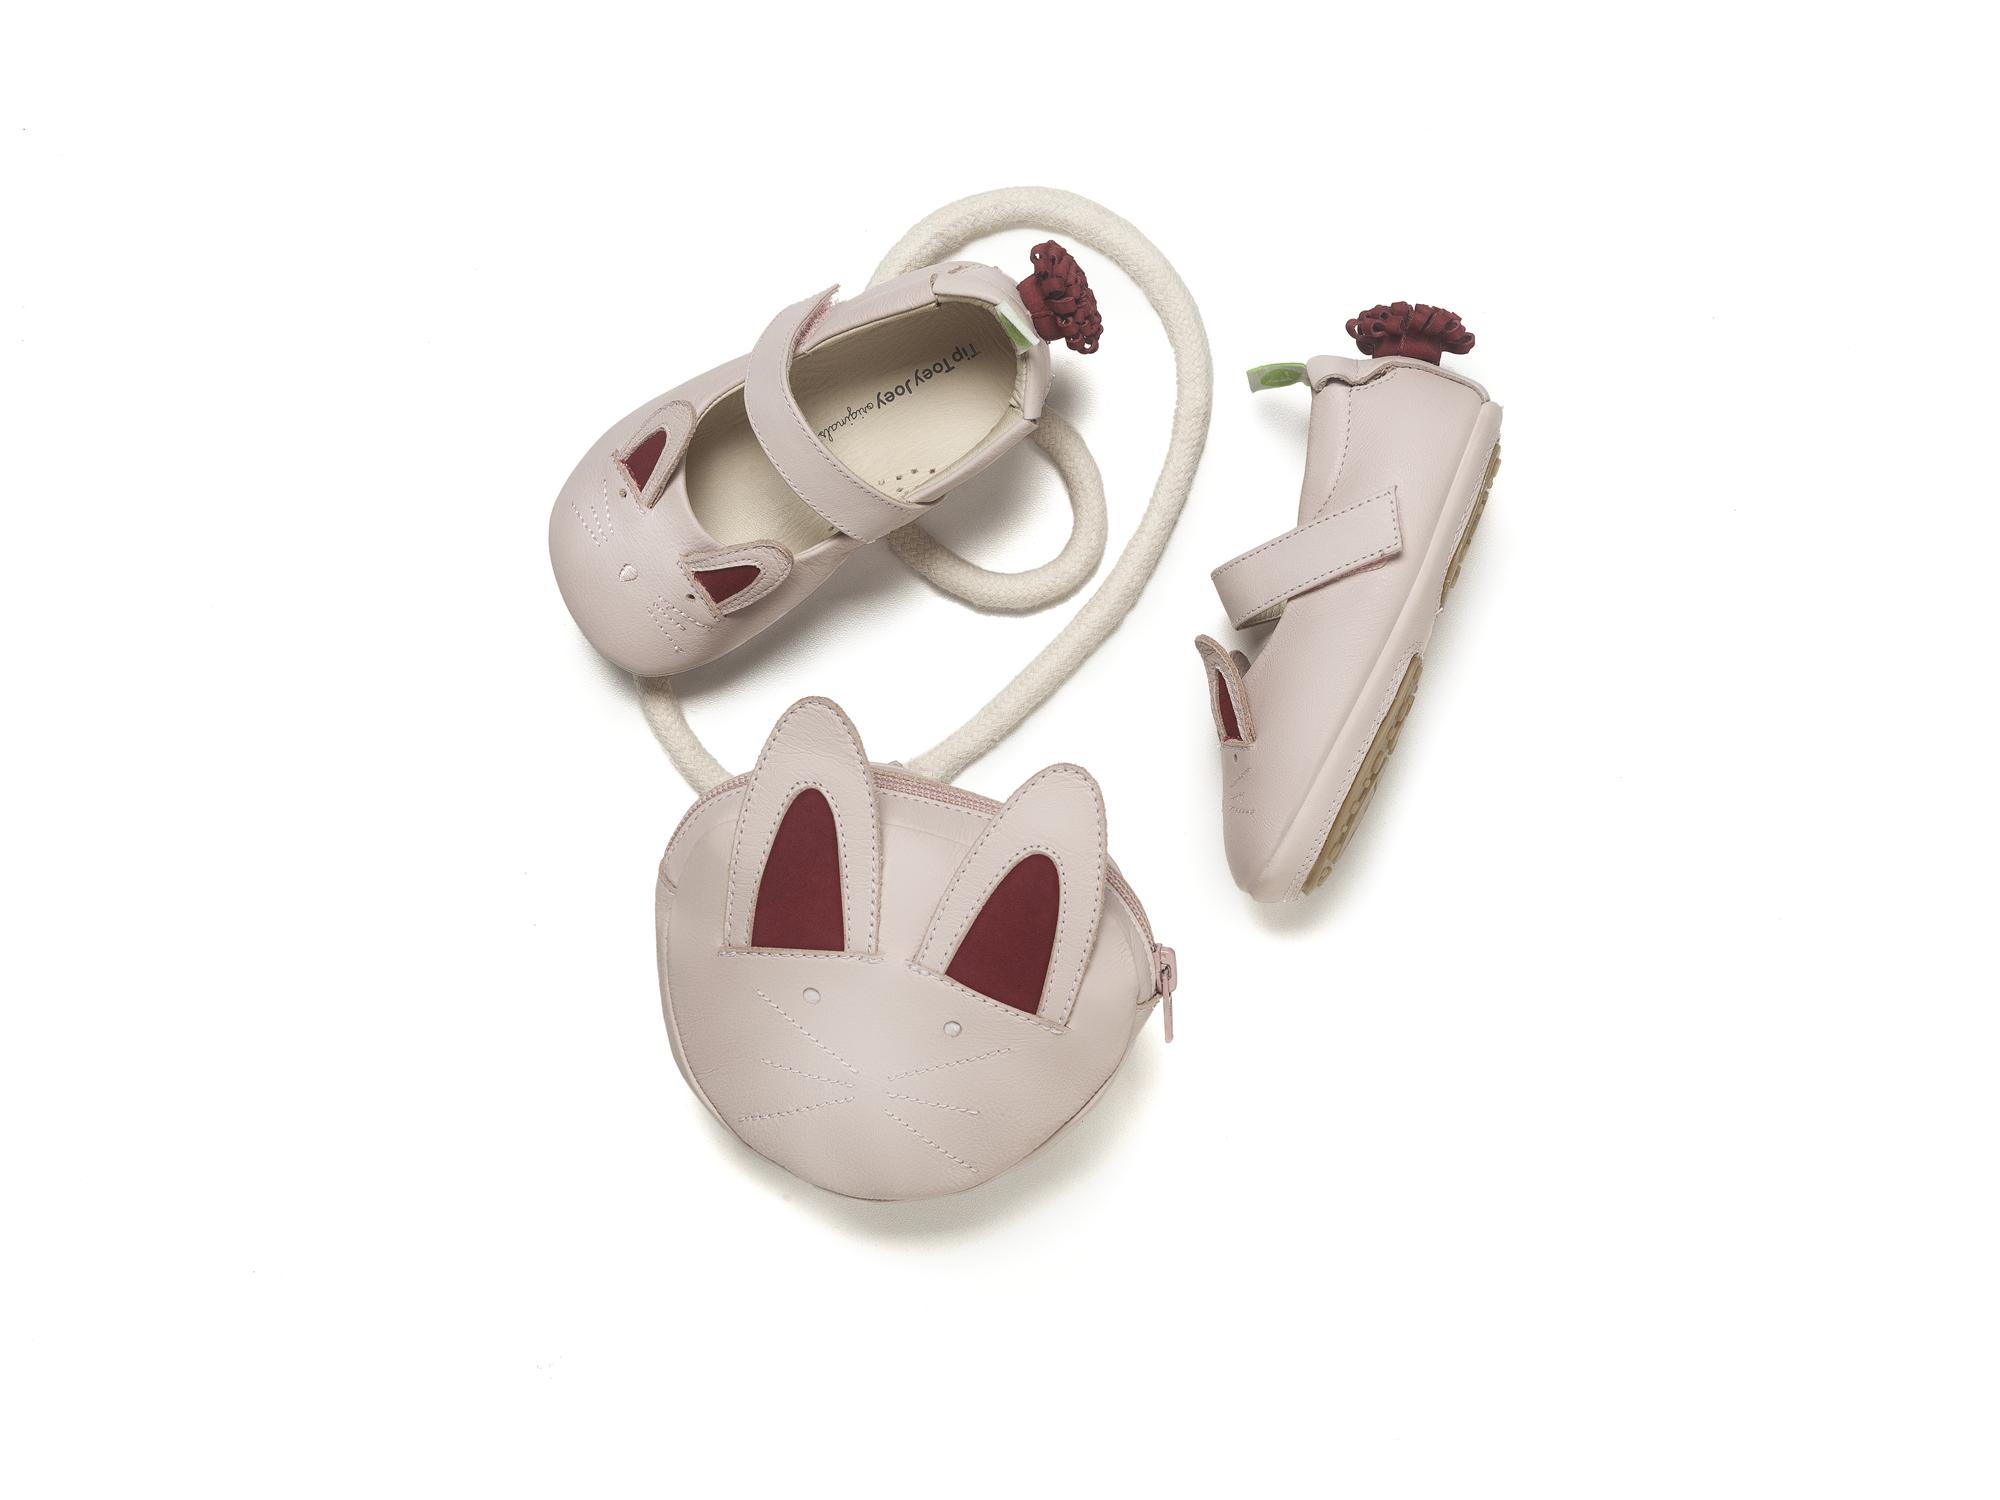 Bolsa Bag Bunny Cotton Candy Toddler 2 à 4 anos - 4